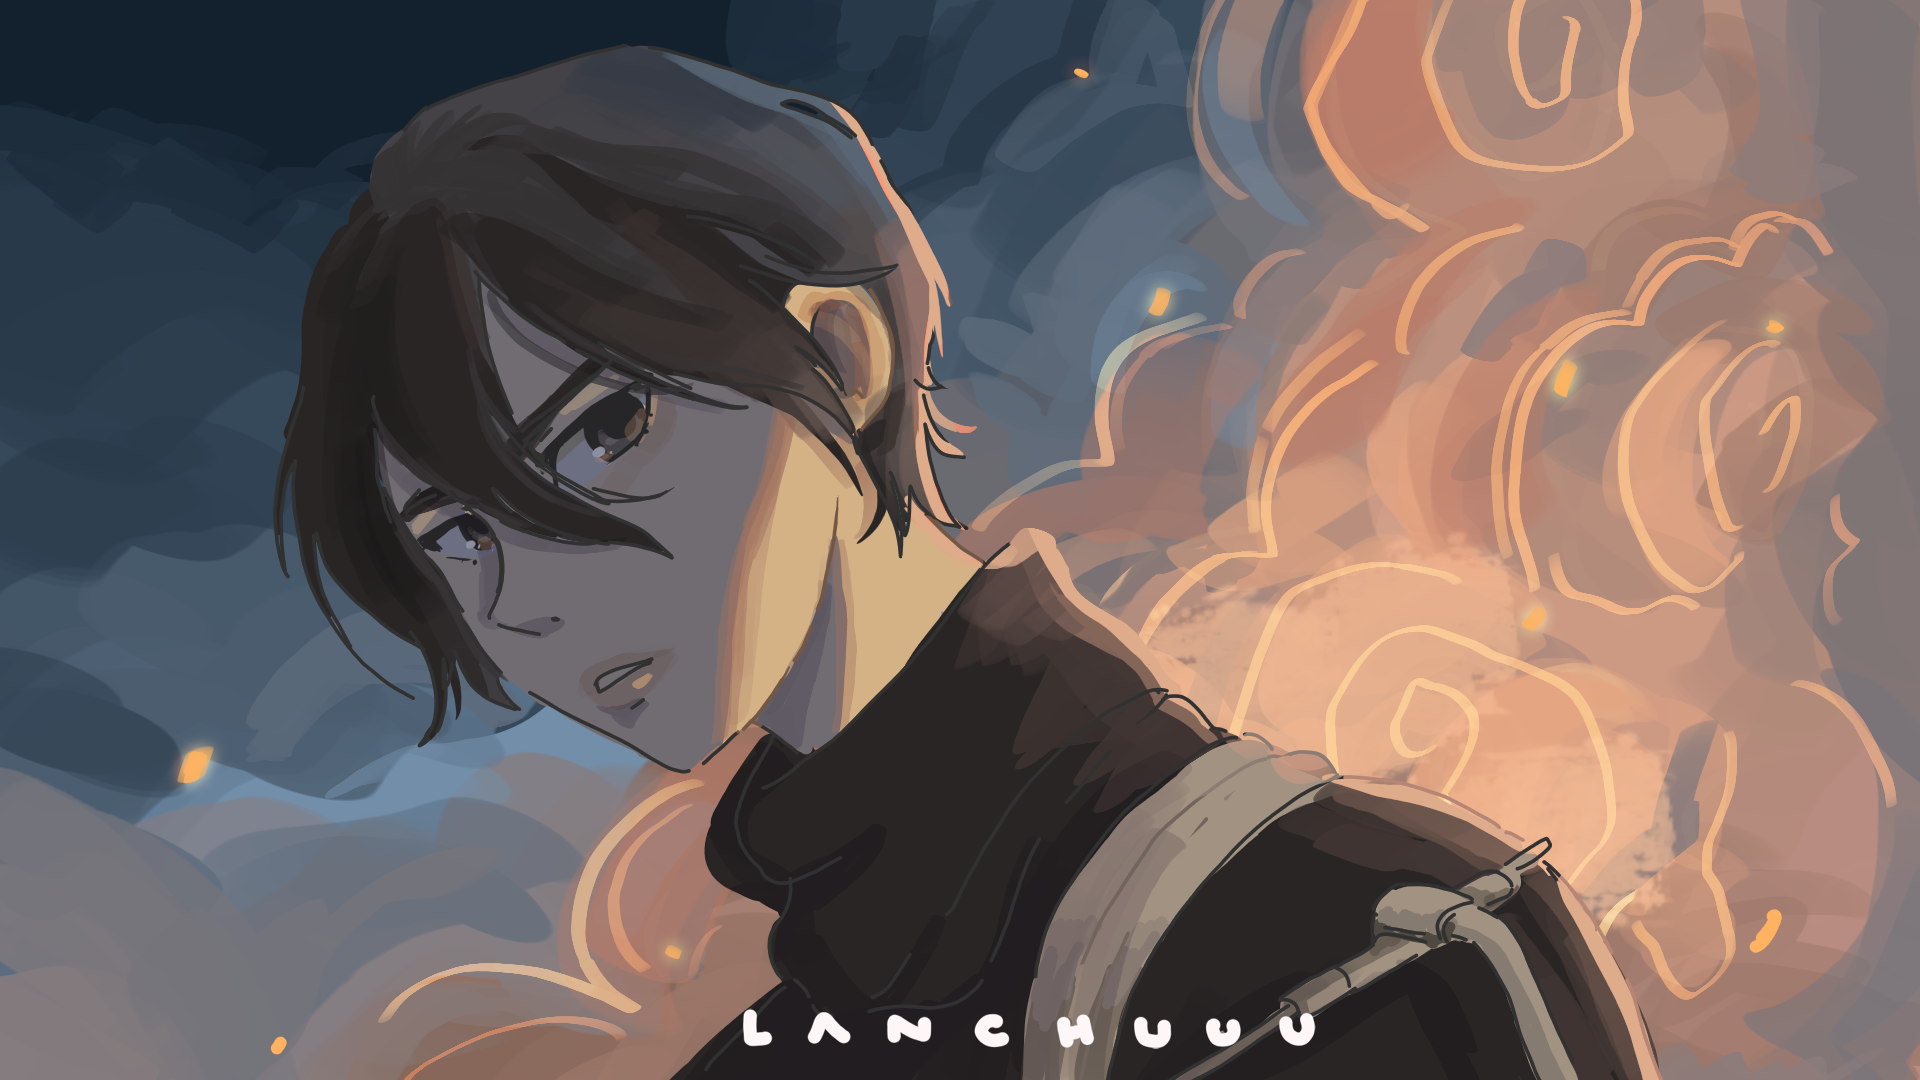 Mikasa Ackerman Season 4 Redraw By Lanchuuu On Deviantart